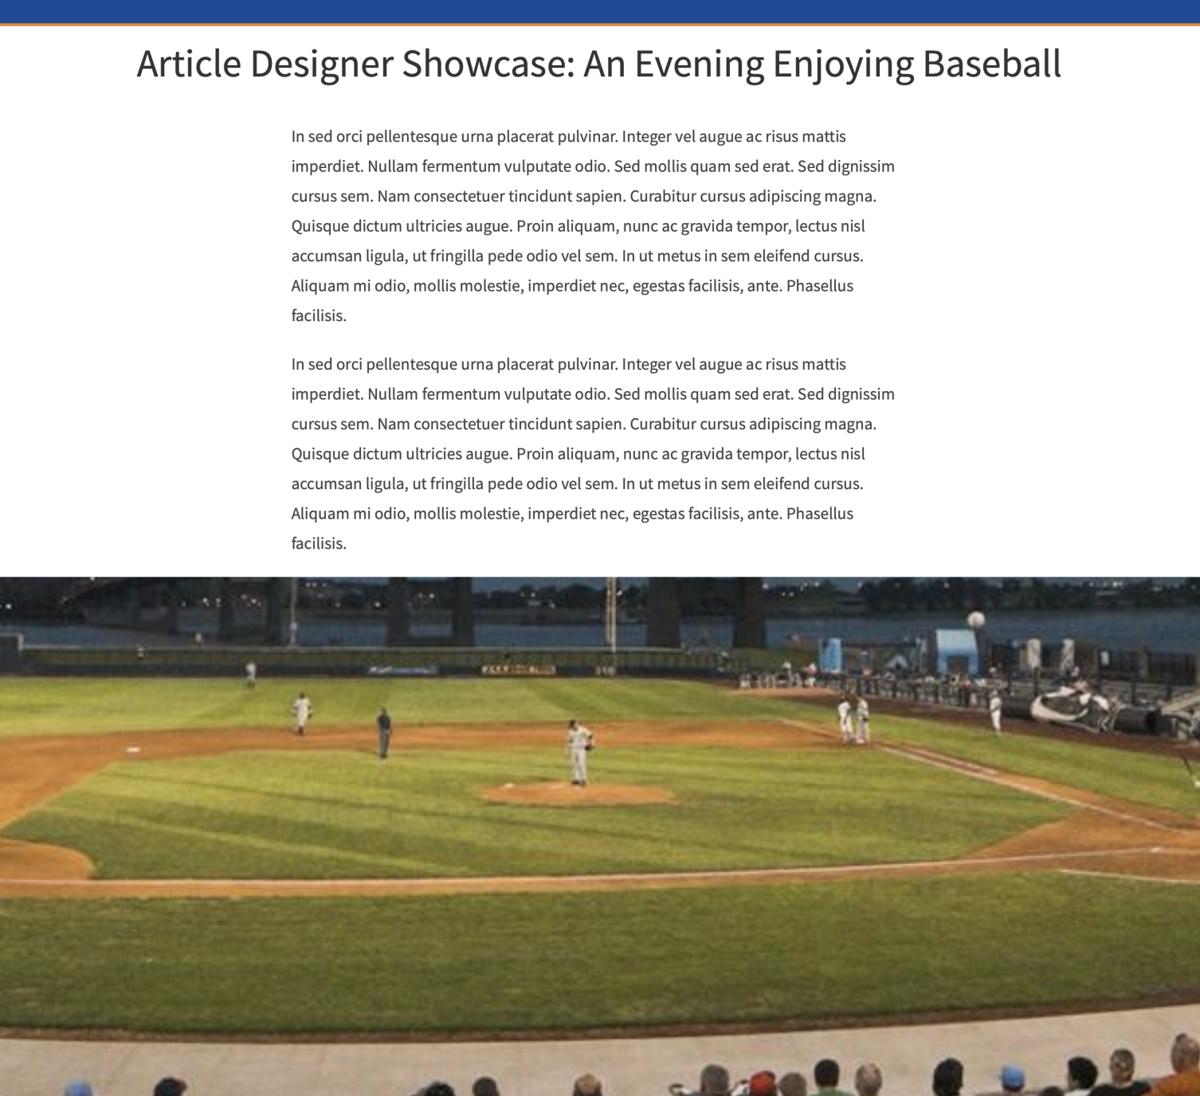 Article Designer example #1: An Evening Enjoying Baseball